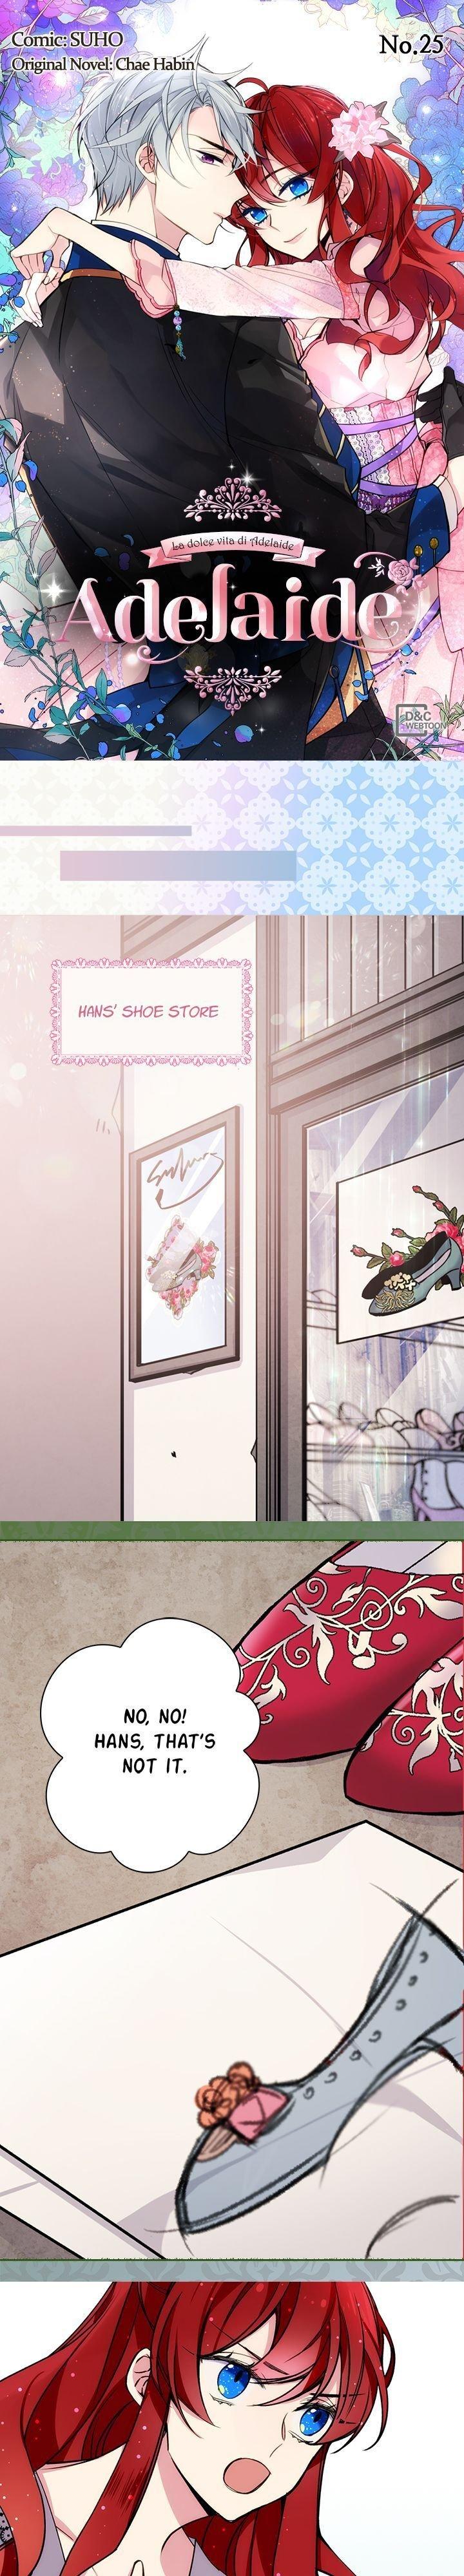 Manga La Dolce Vita Di Adelaide - Chapter 25 Page 1